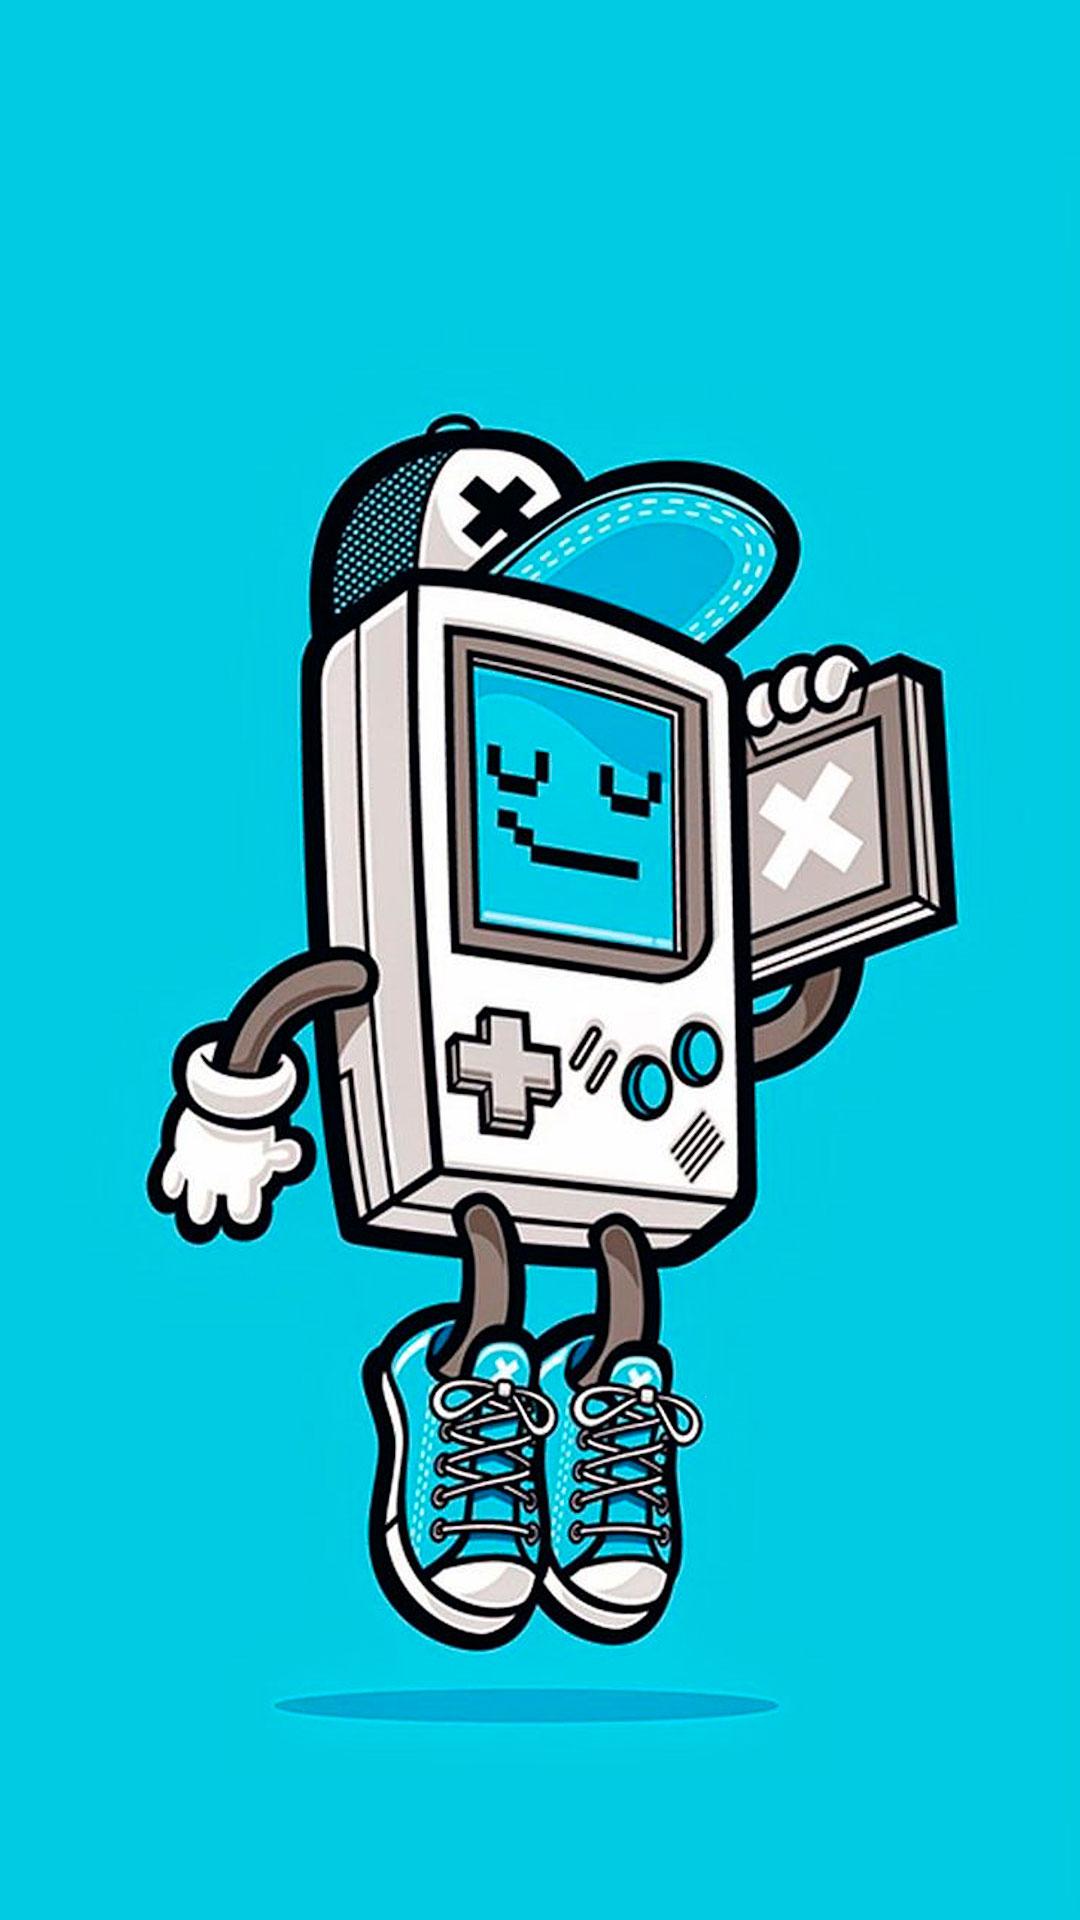 iPhone wallpaper retro games gameboy Retro games